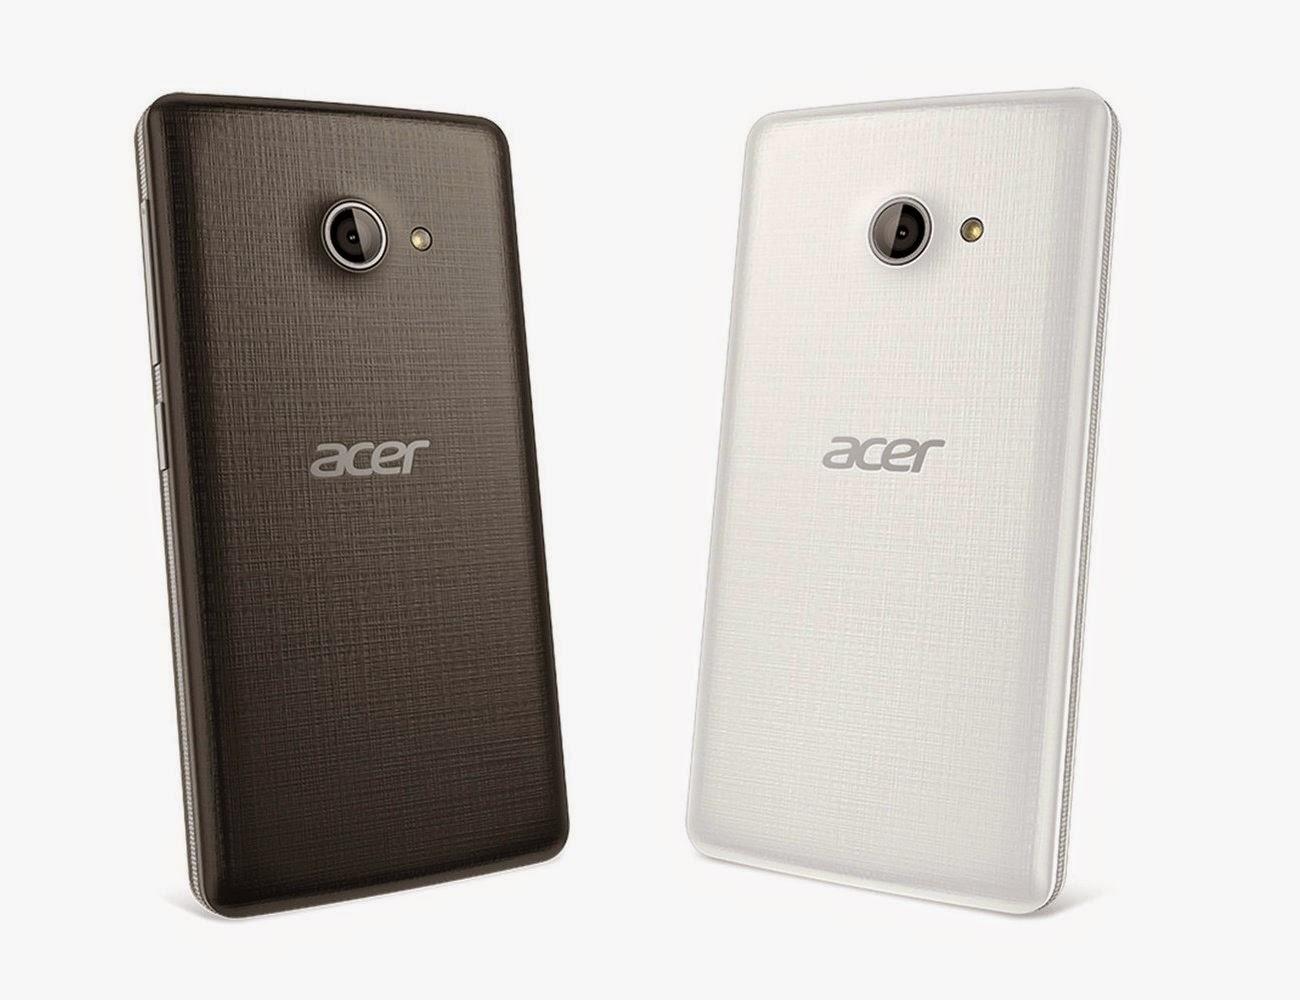 4 Buah Gambar Acer Liquid M220 Ponsel